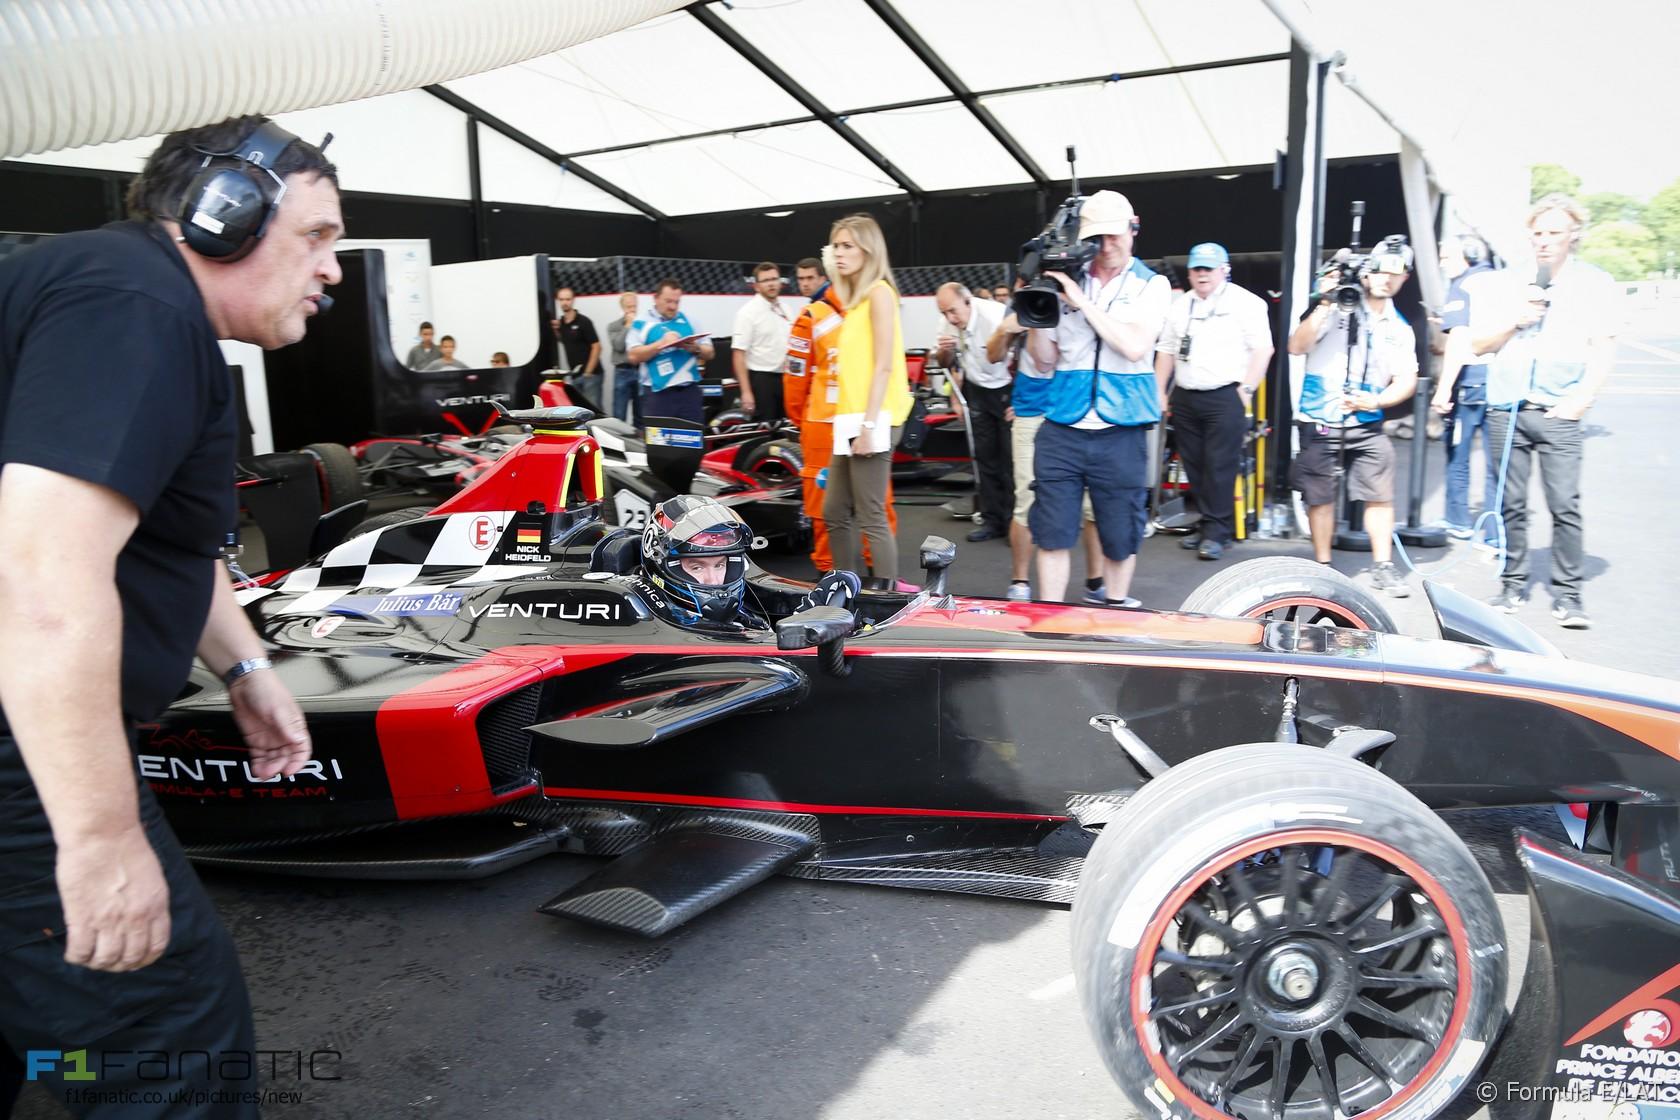 Nick Heidfeld, Formula E, Battersea Park, 2015